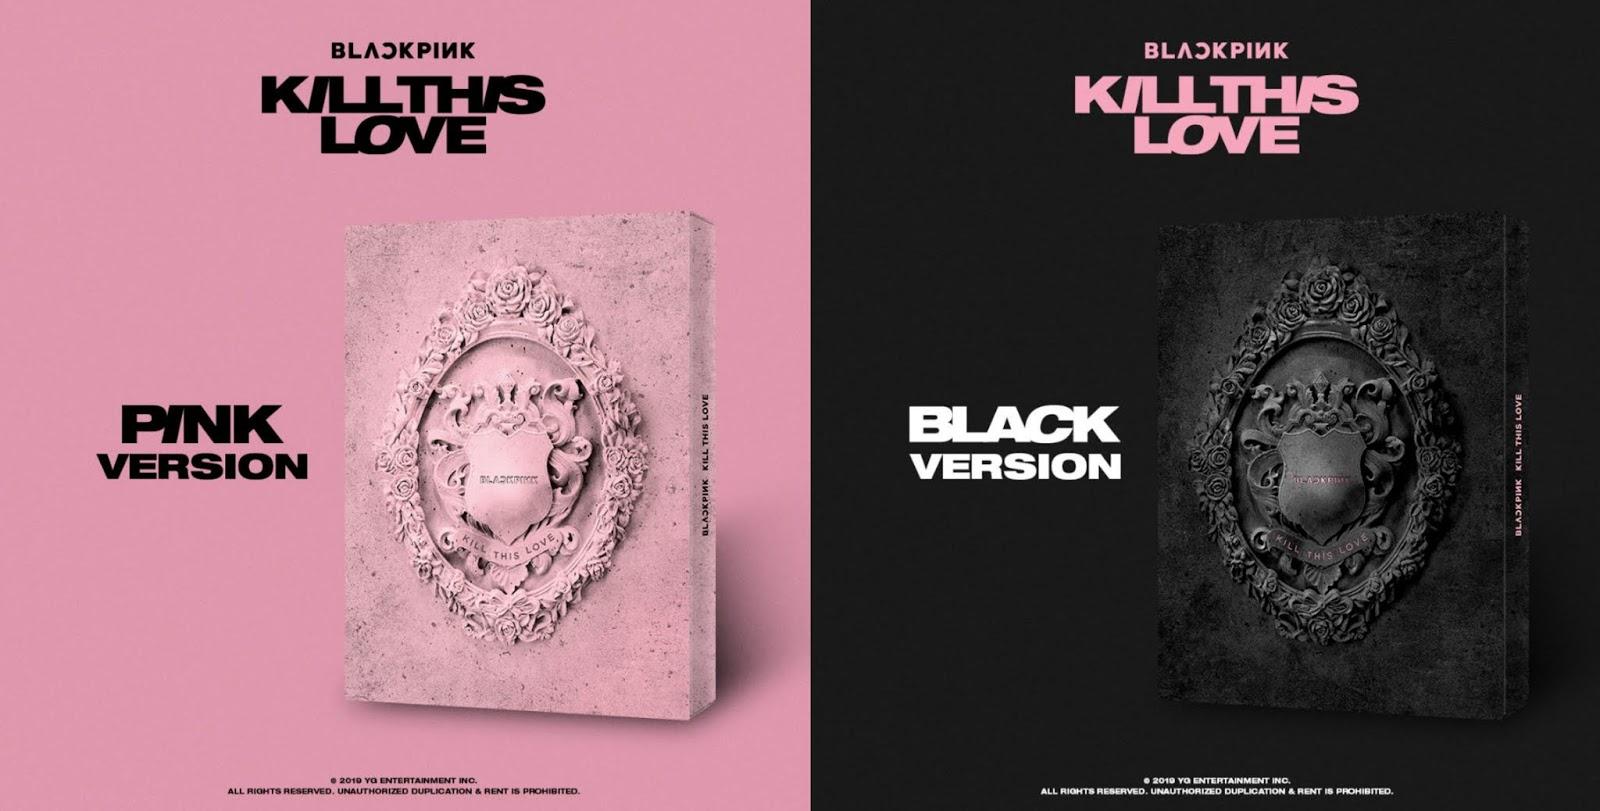 BLACKPINK 2ND MINI ALBUM [KILL THIS LOVE] Order